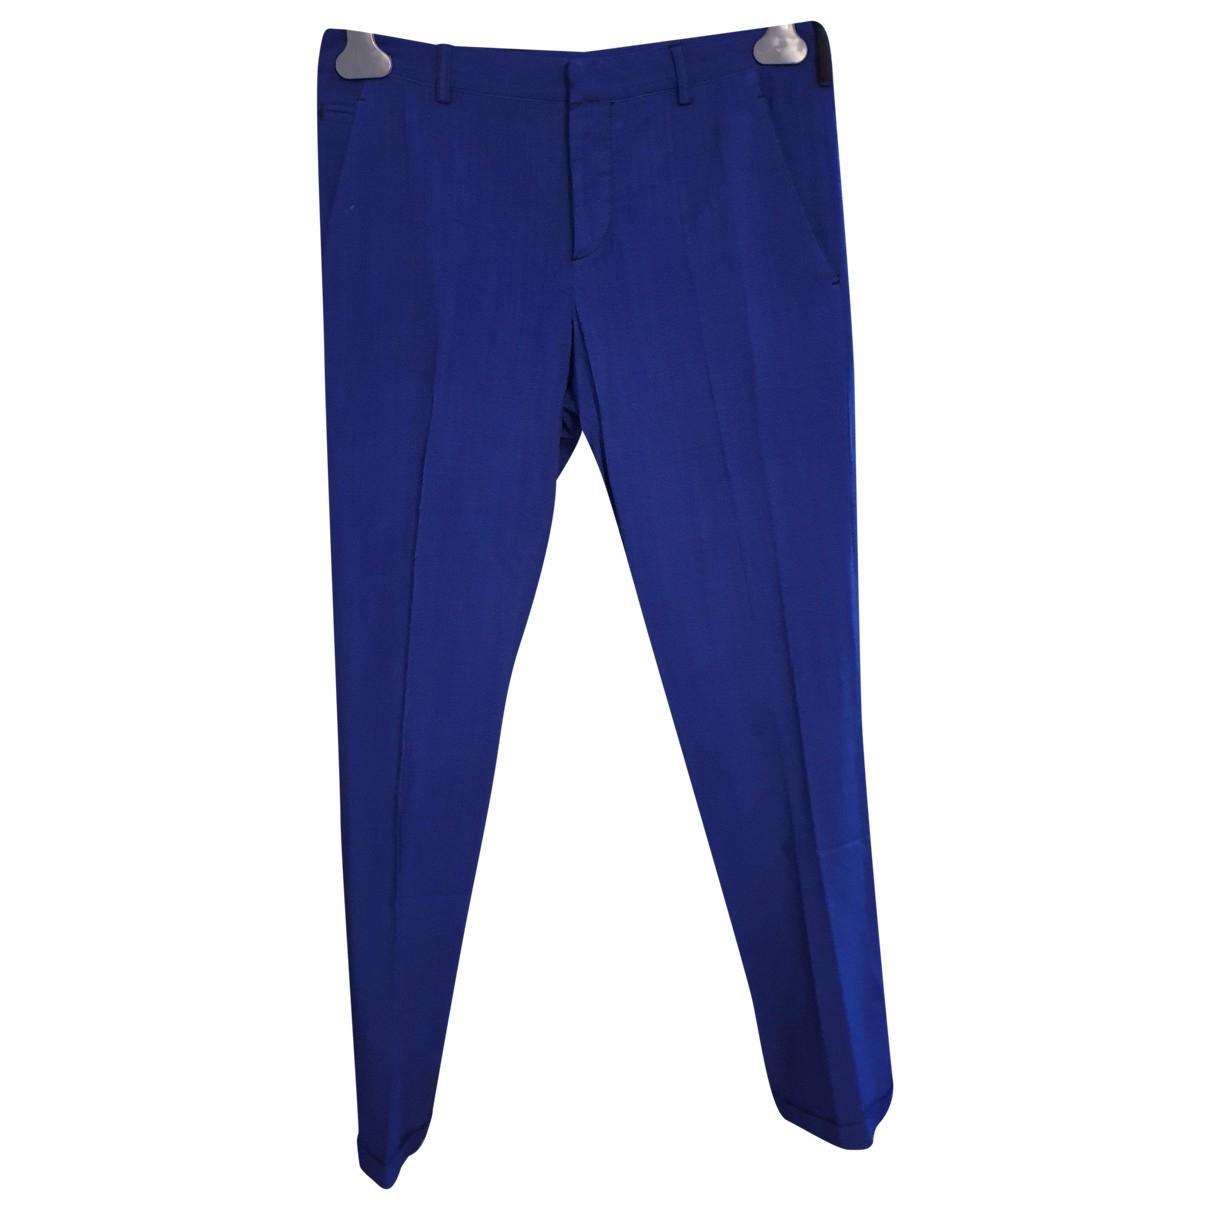 Pantalones en Algodon Azul Prada